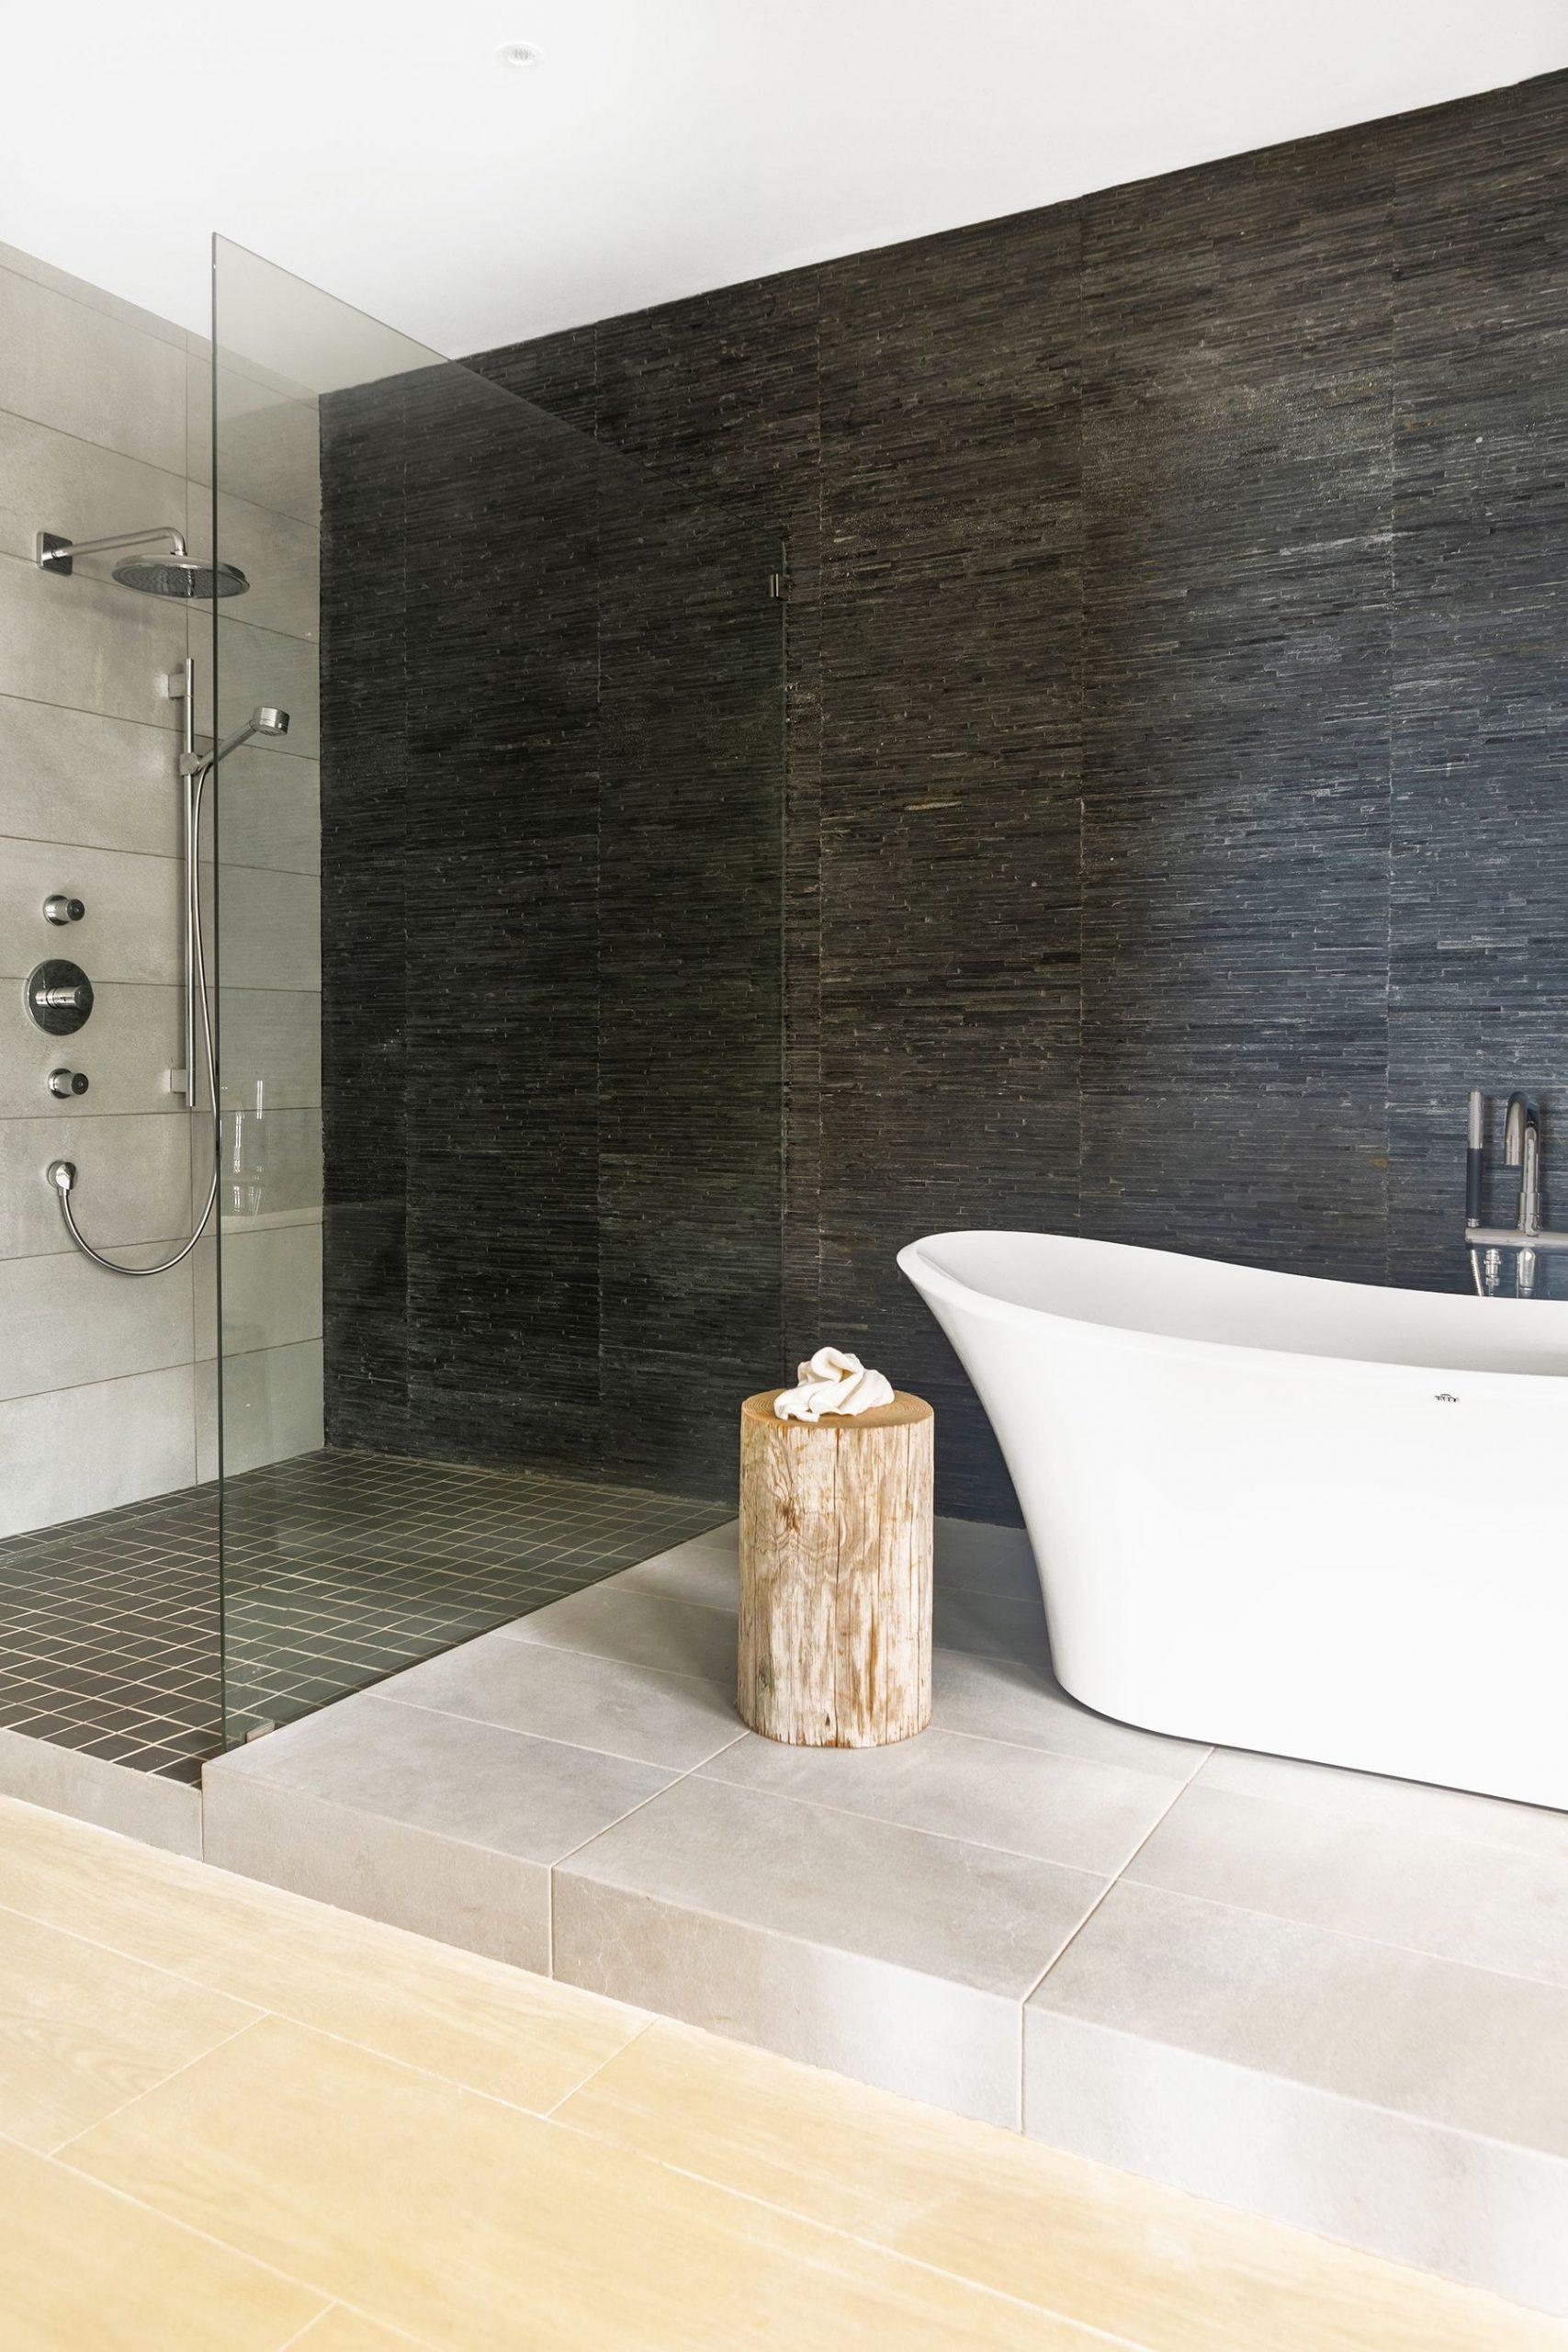 The main advantages of bathroom floor tile